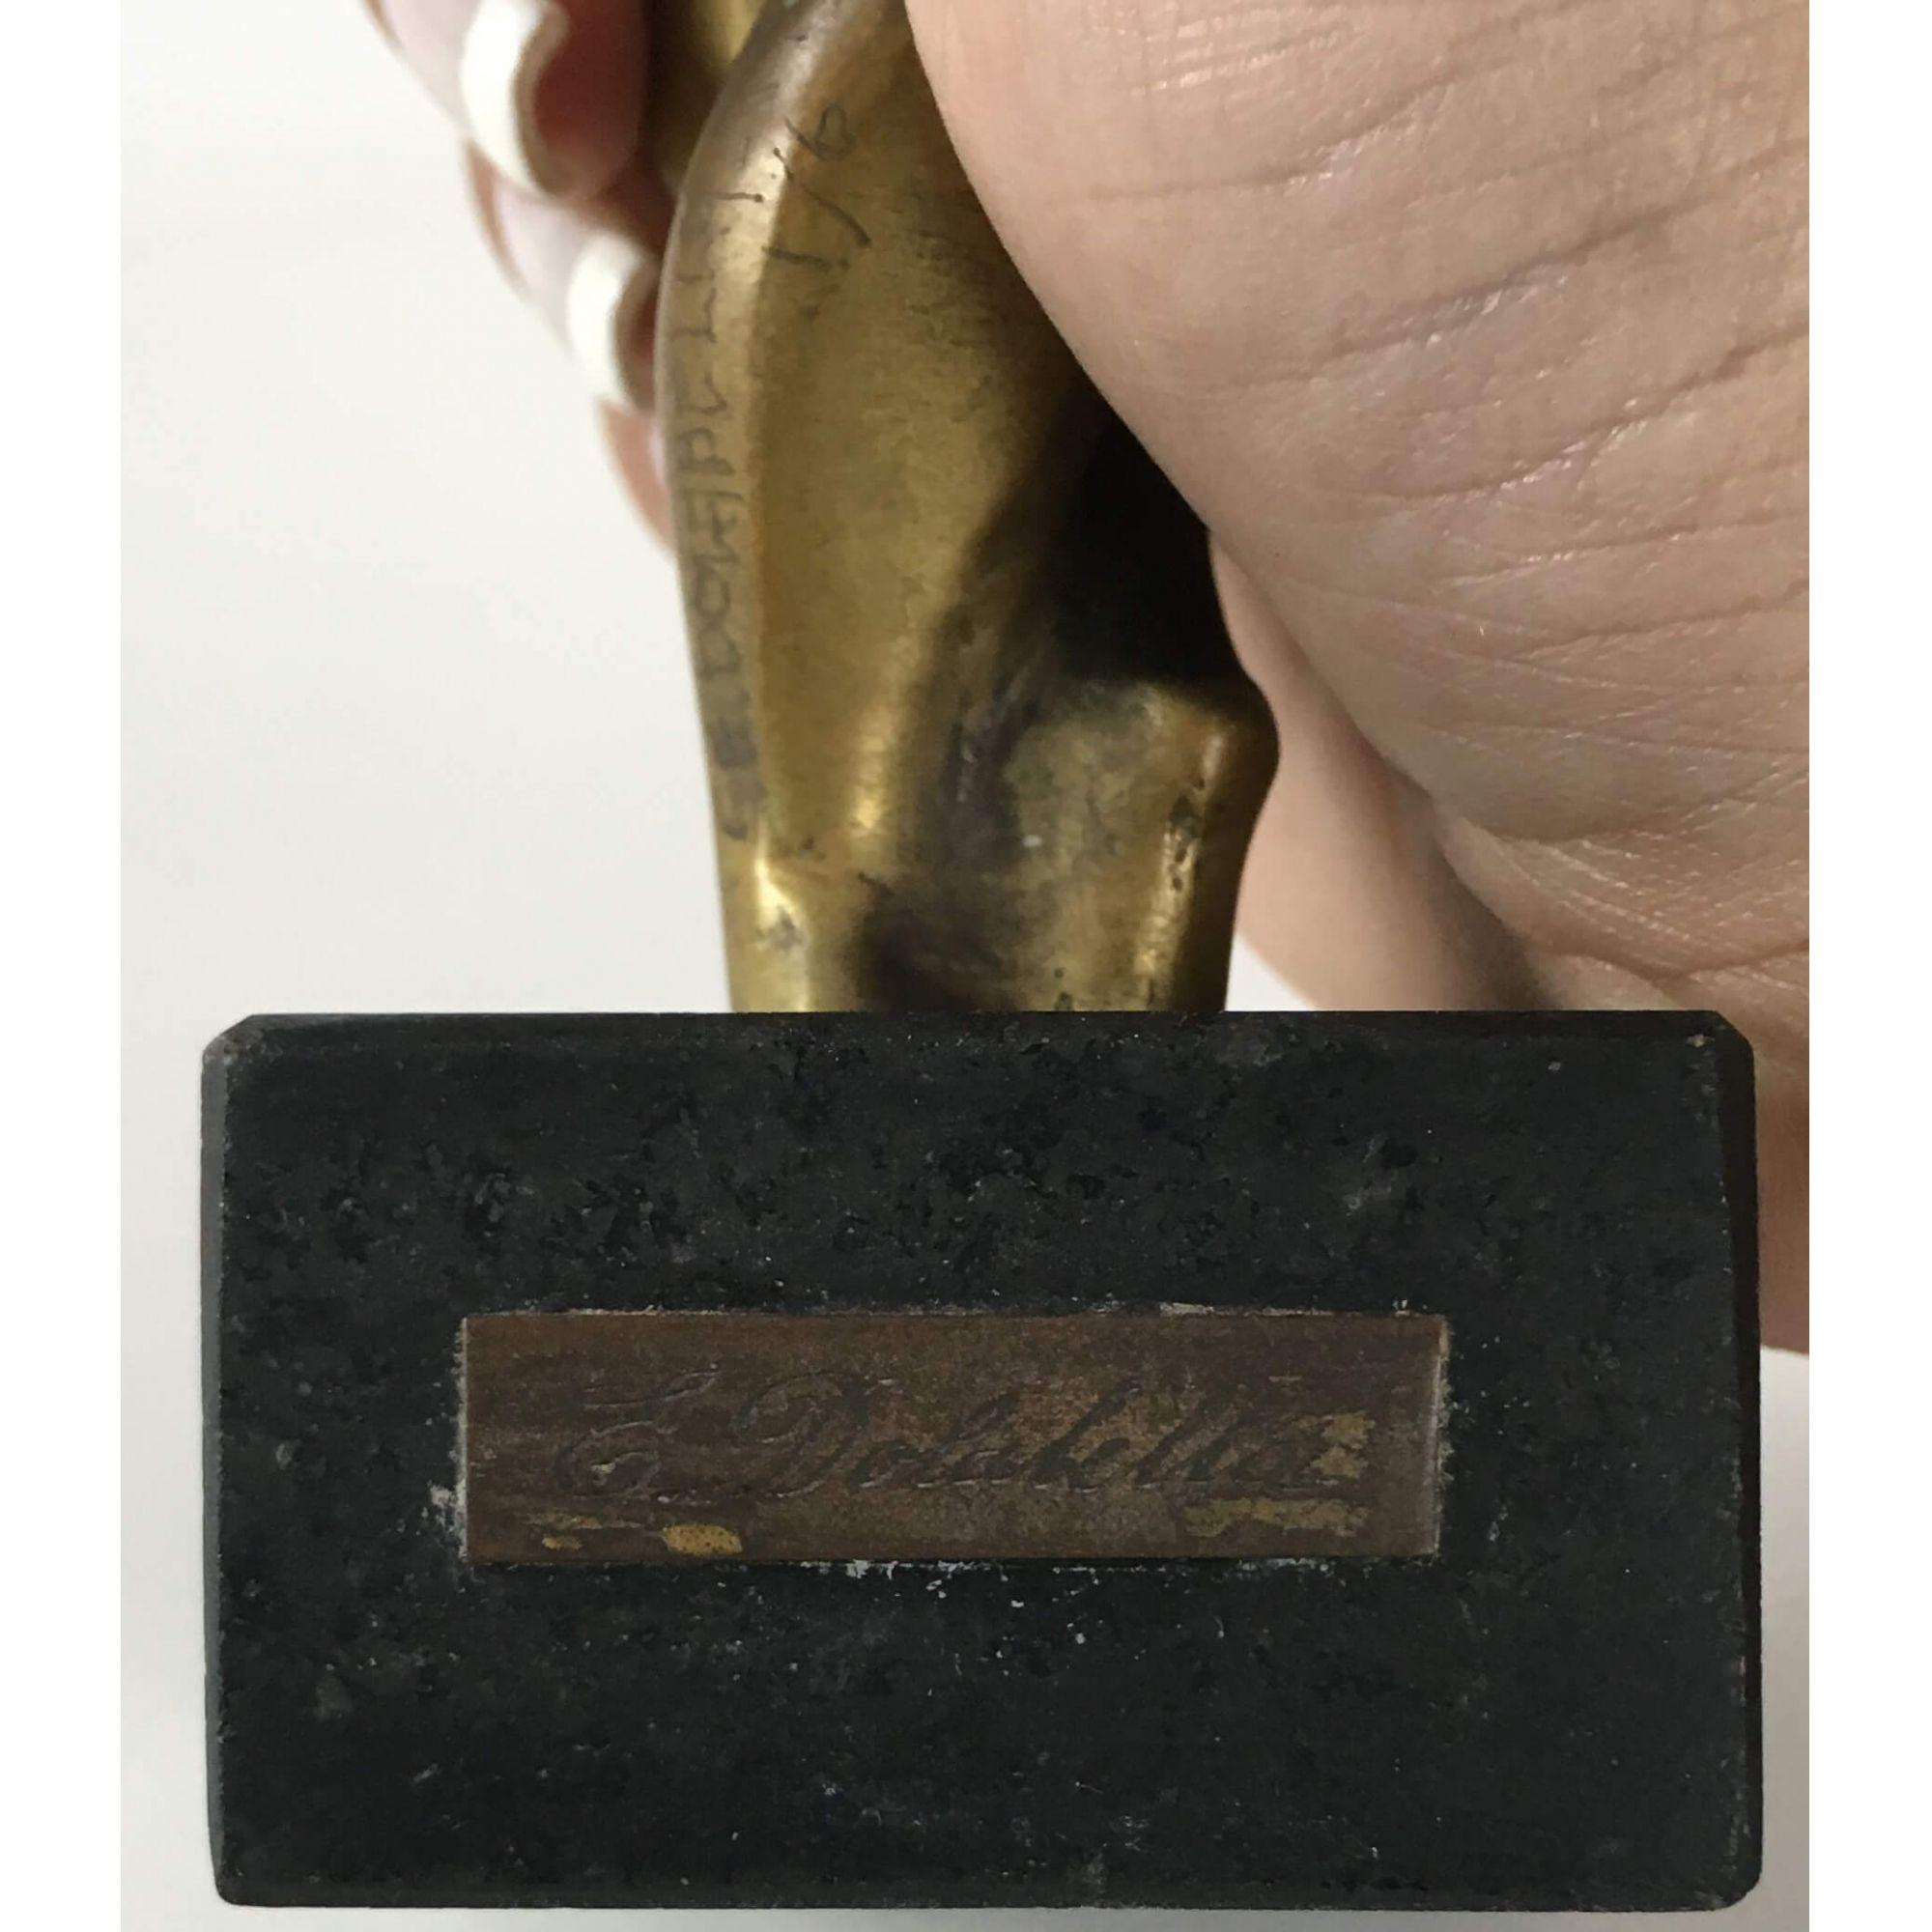 Antiga Escultura Em Bronze Nu Feminino E. Dolabella